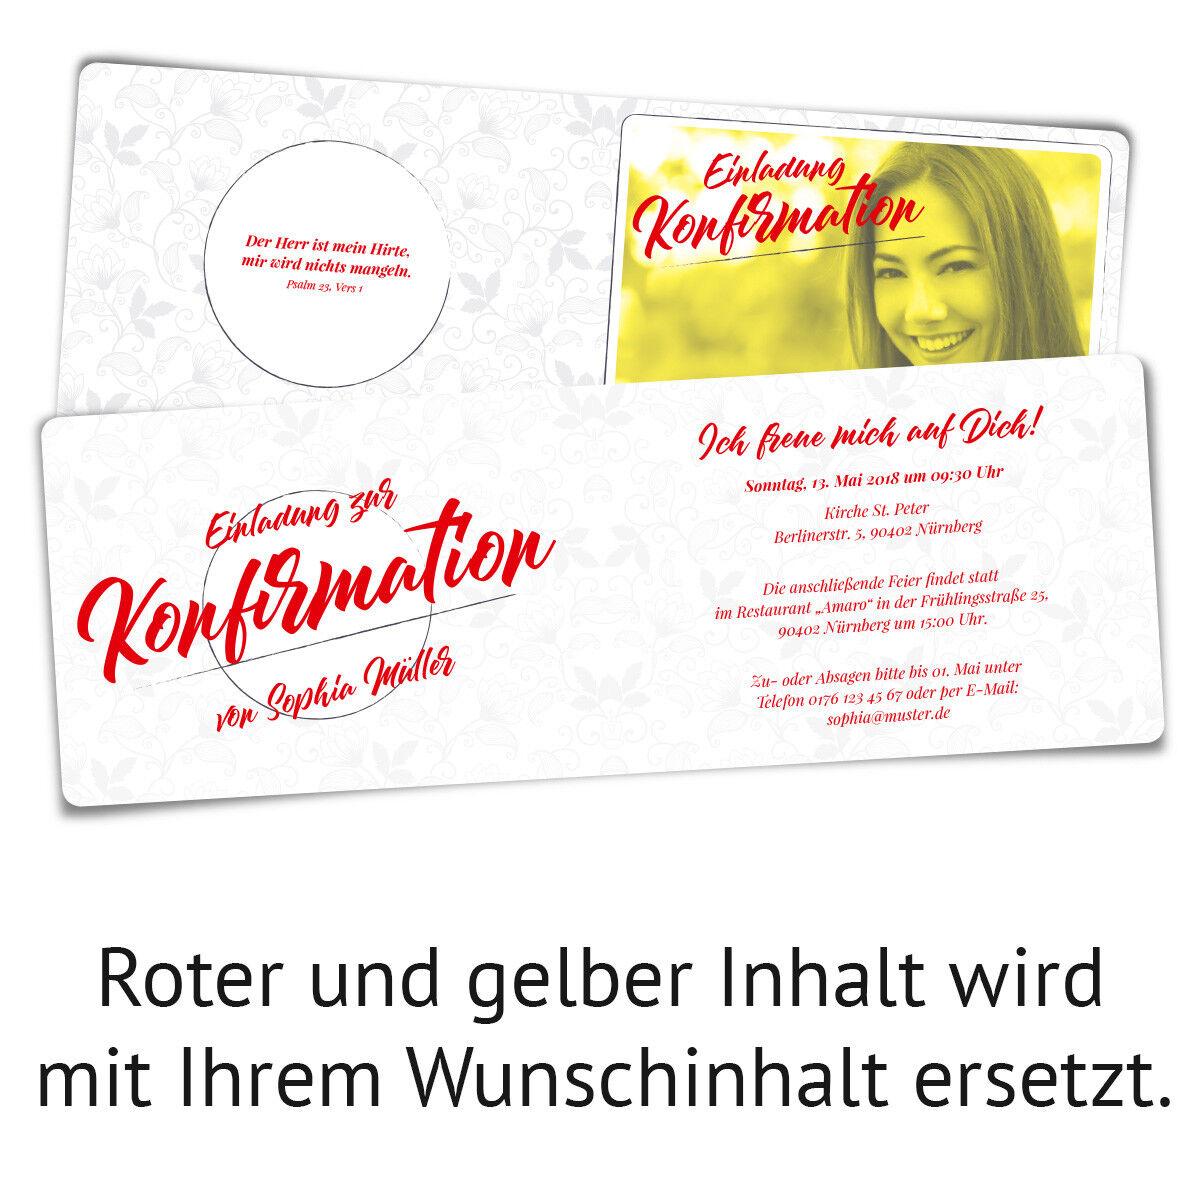 Konfirmation Einladungskarten Konfirmationskarten Einladungen - Blaumenranken Blaumenranken Blaumenranken | Verrückter Preis  | Feine Verarbeitung  b47d6b